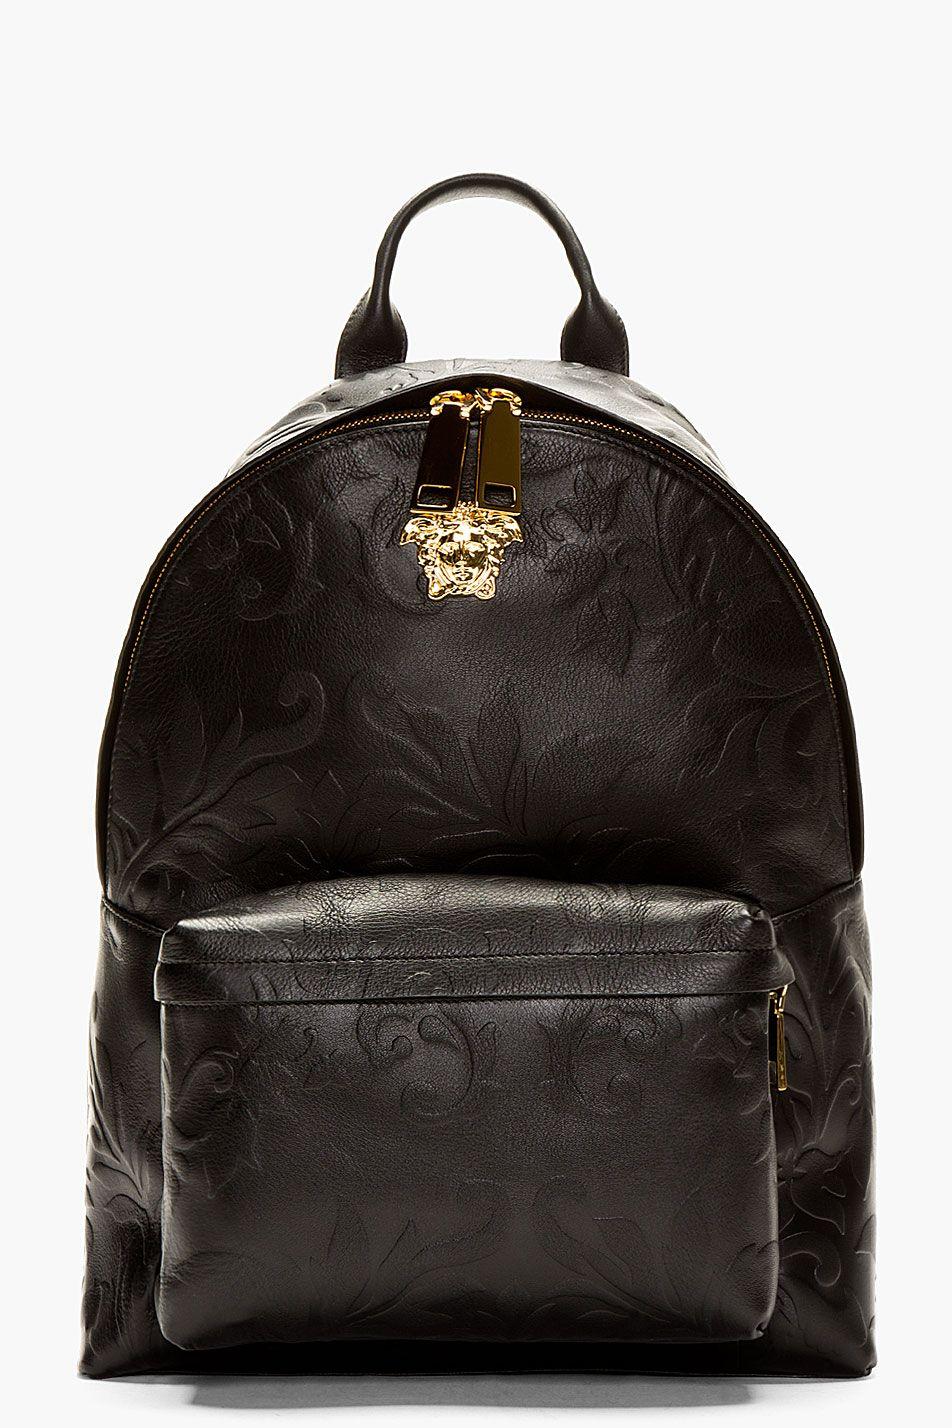 Versace backpack. Versace backpack Versace Backpack 65962001855c7